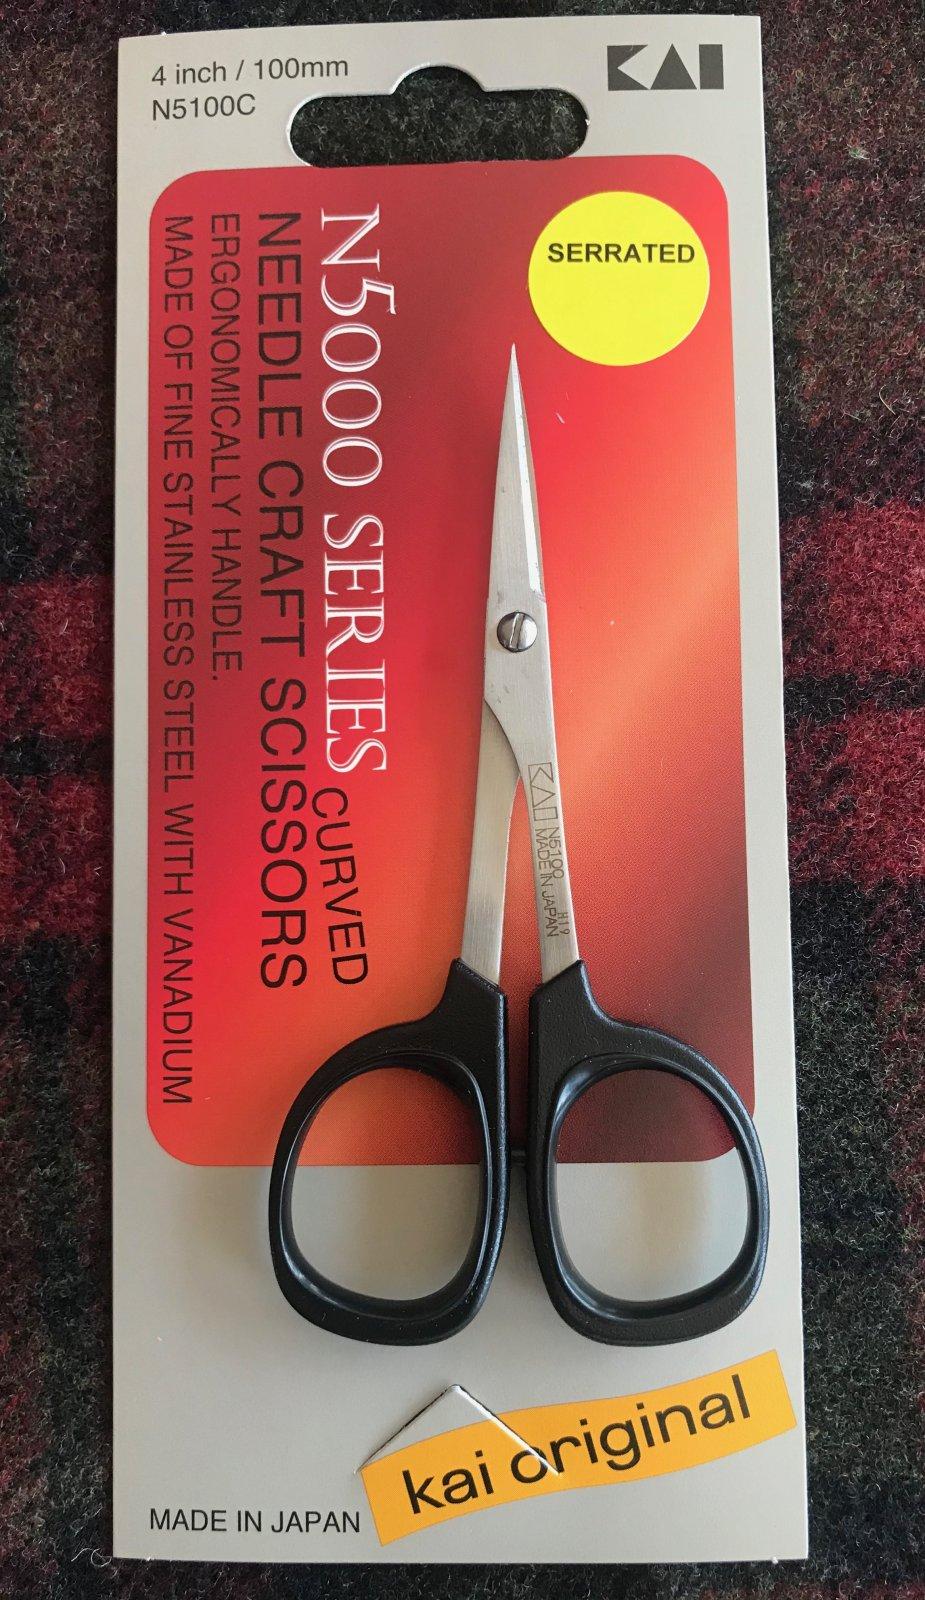 Kai Needle Craft Scissors 4 Inch Serrated Curved